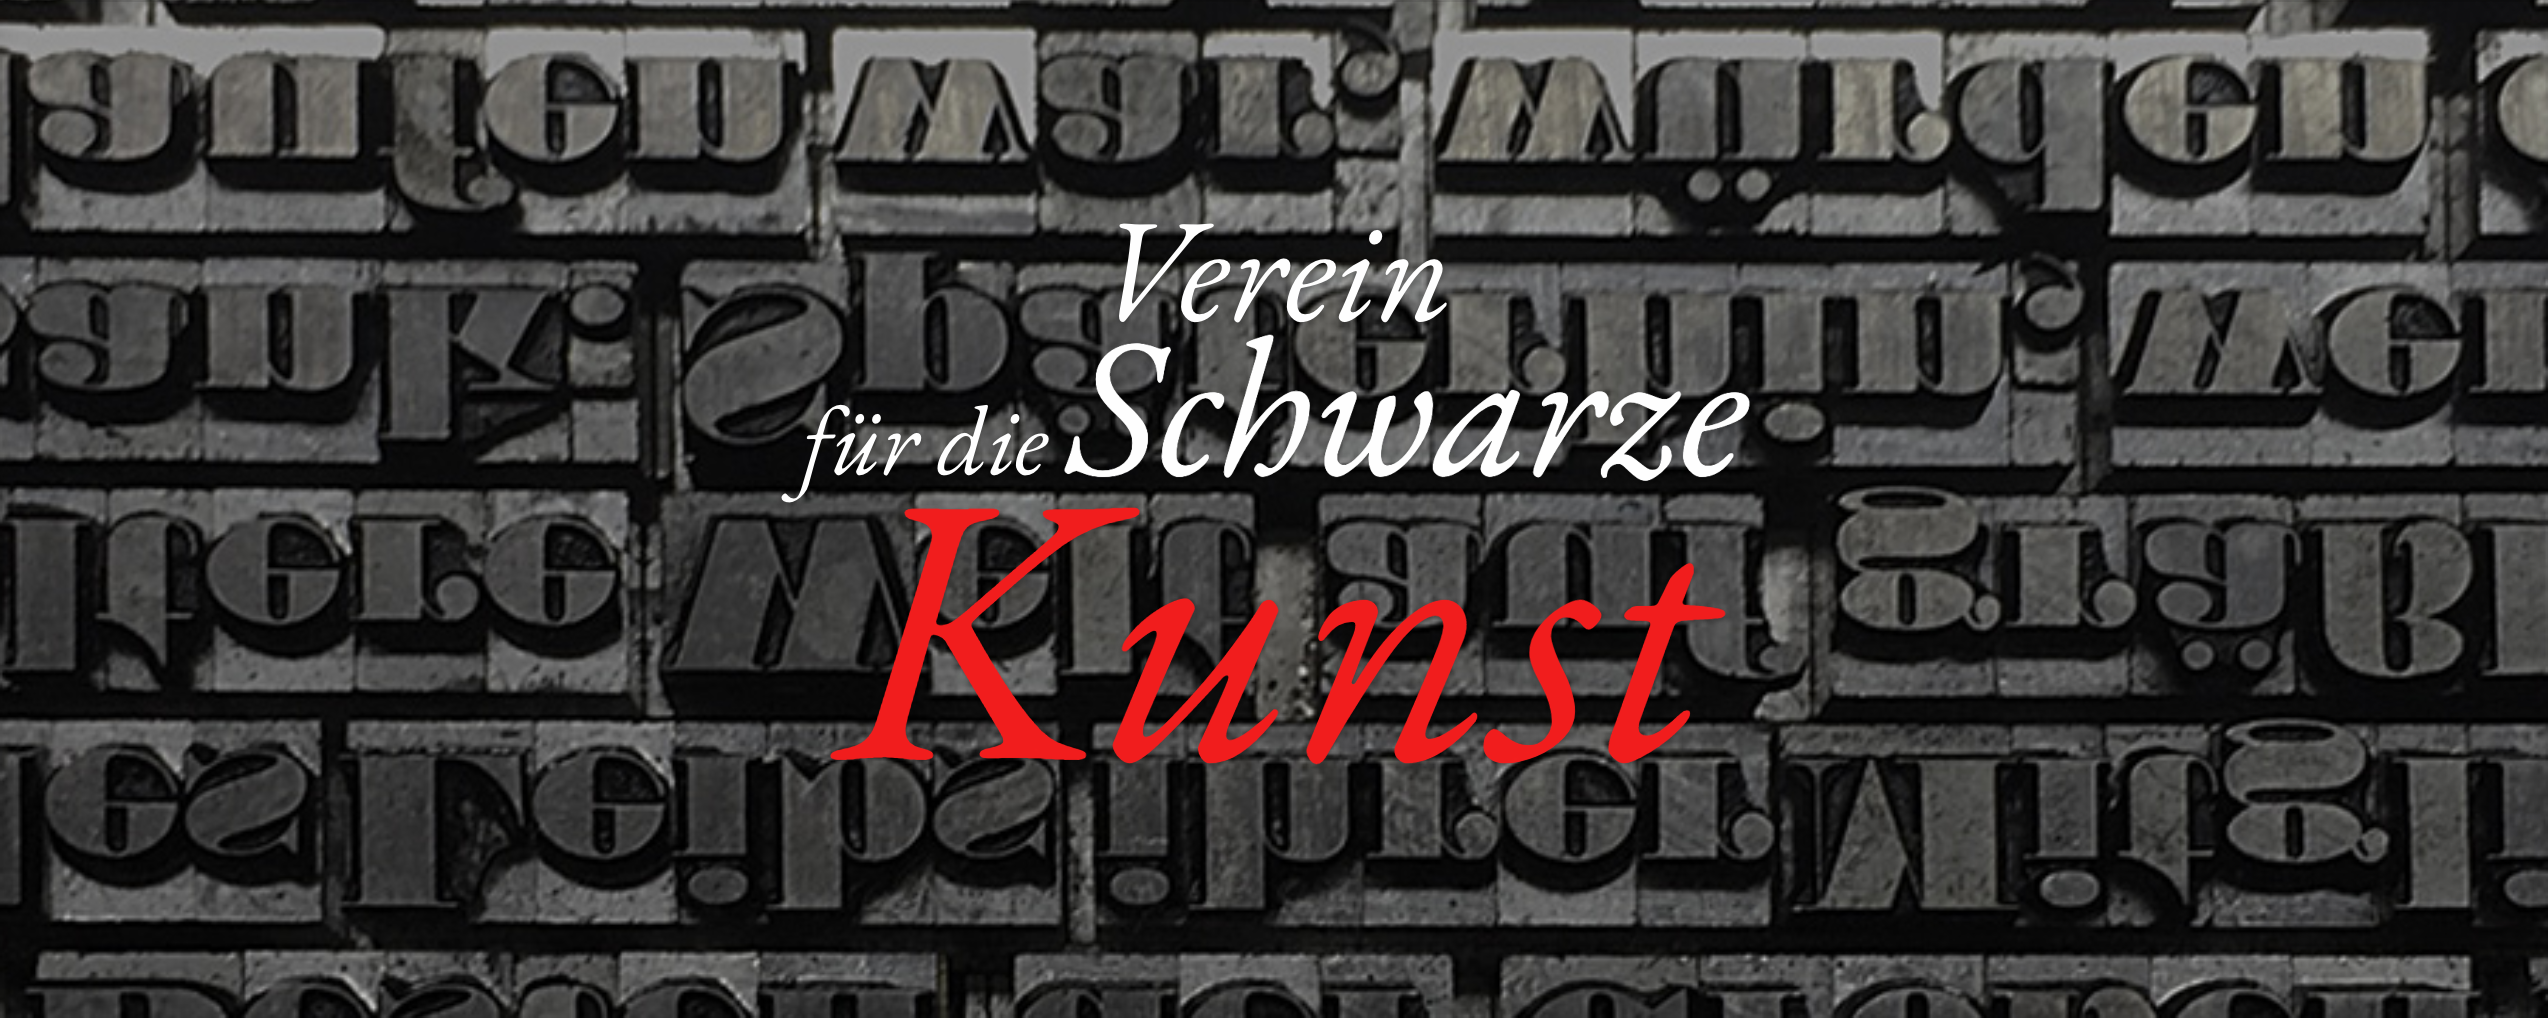 Walz Stipendium & Schwarze-Kunst-Preis